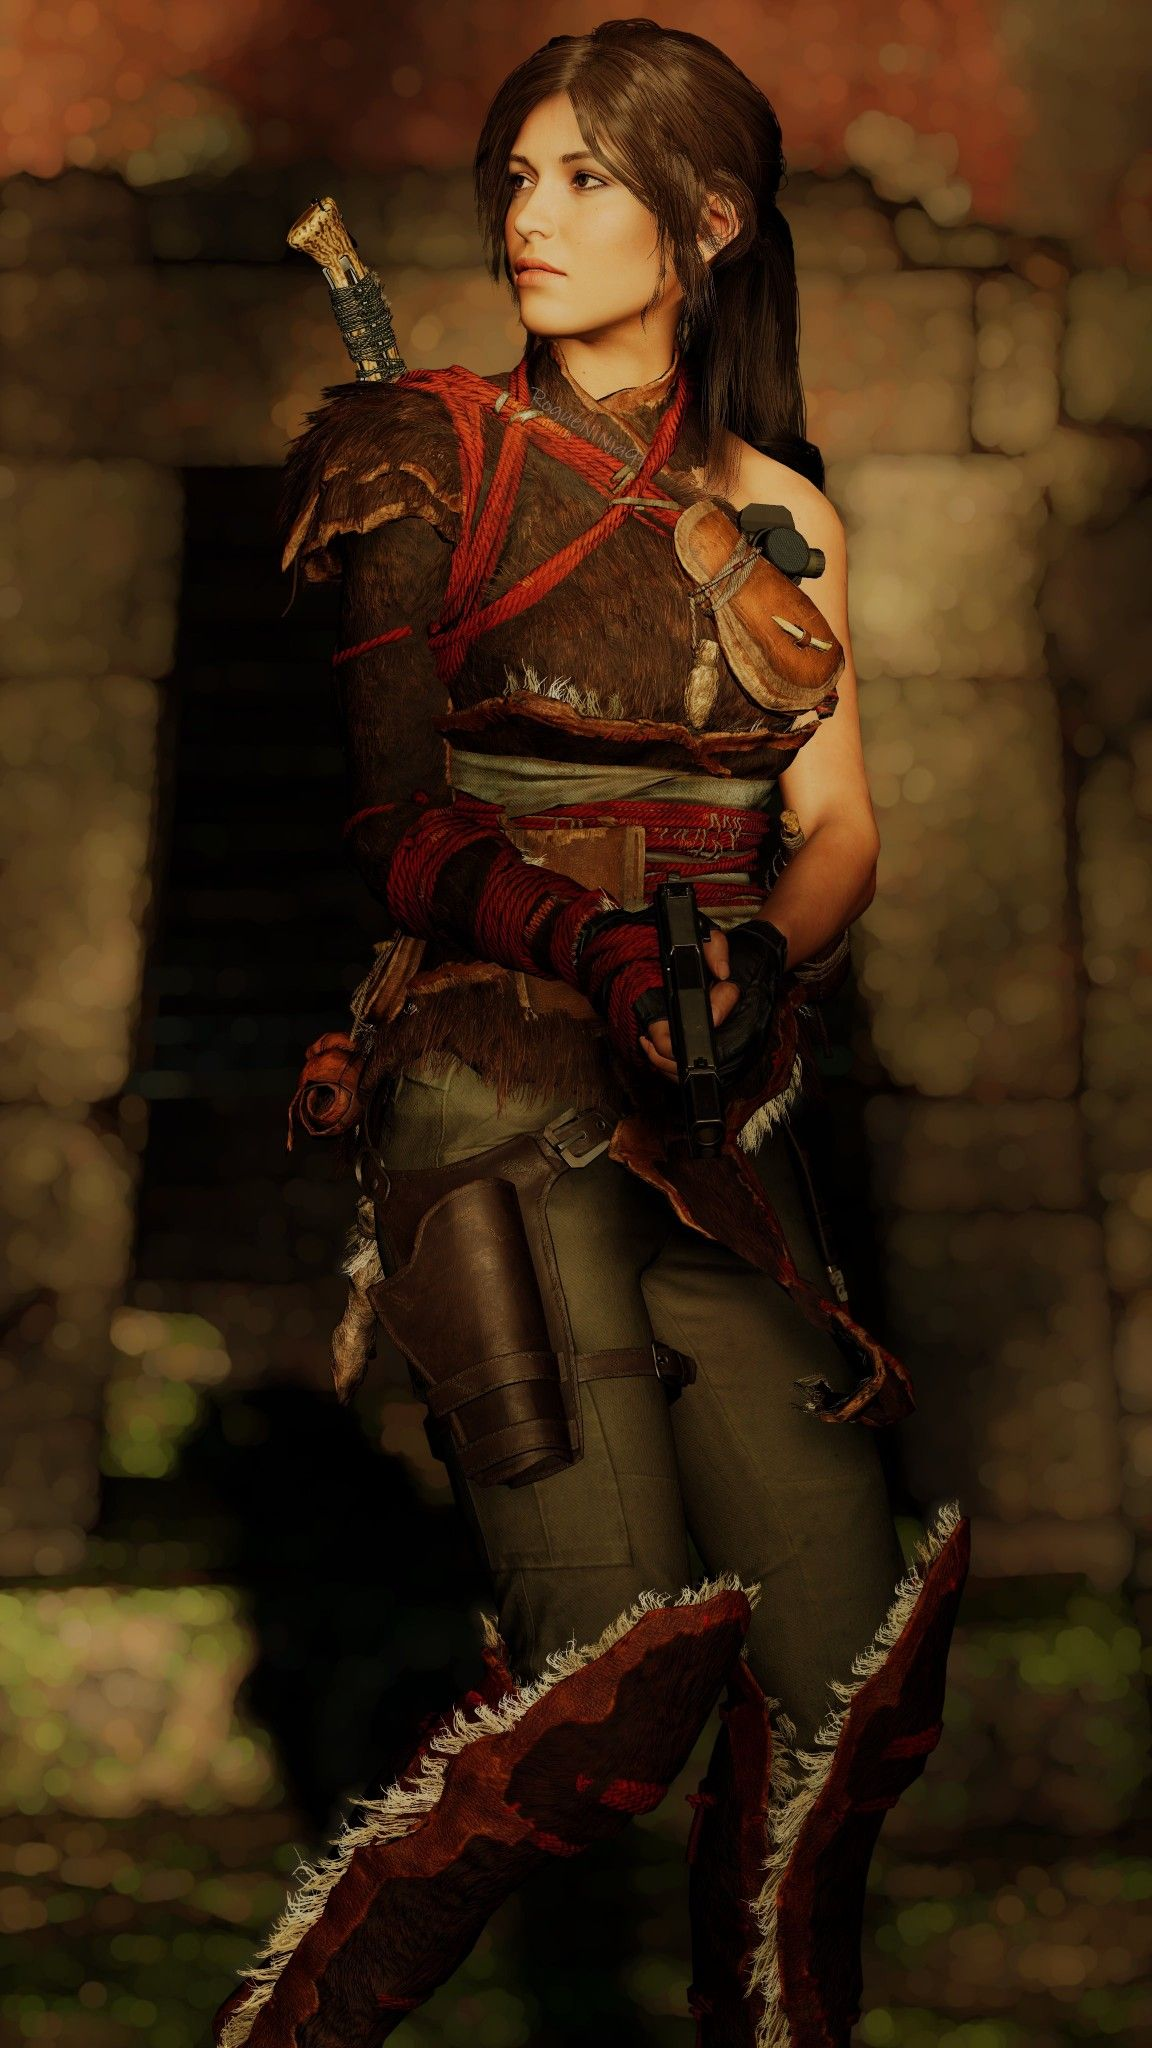 Lara Croft Sottr Tomb Raider Lara Croft Lara Croft Tomb Raider Game